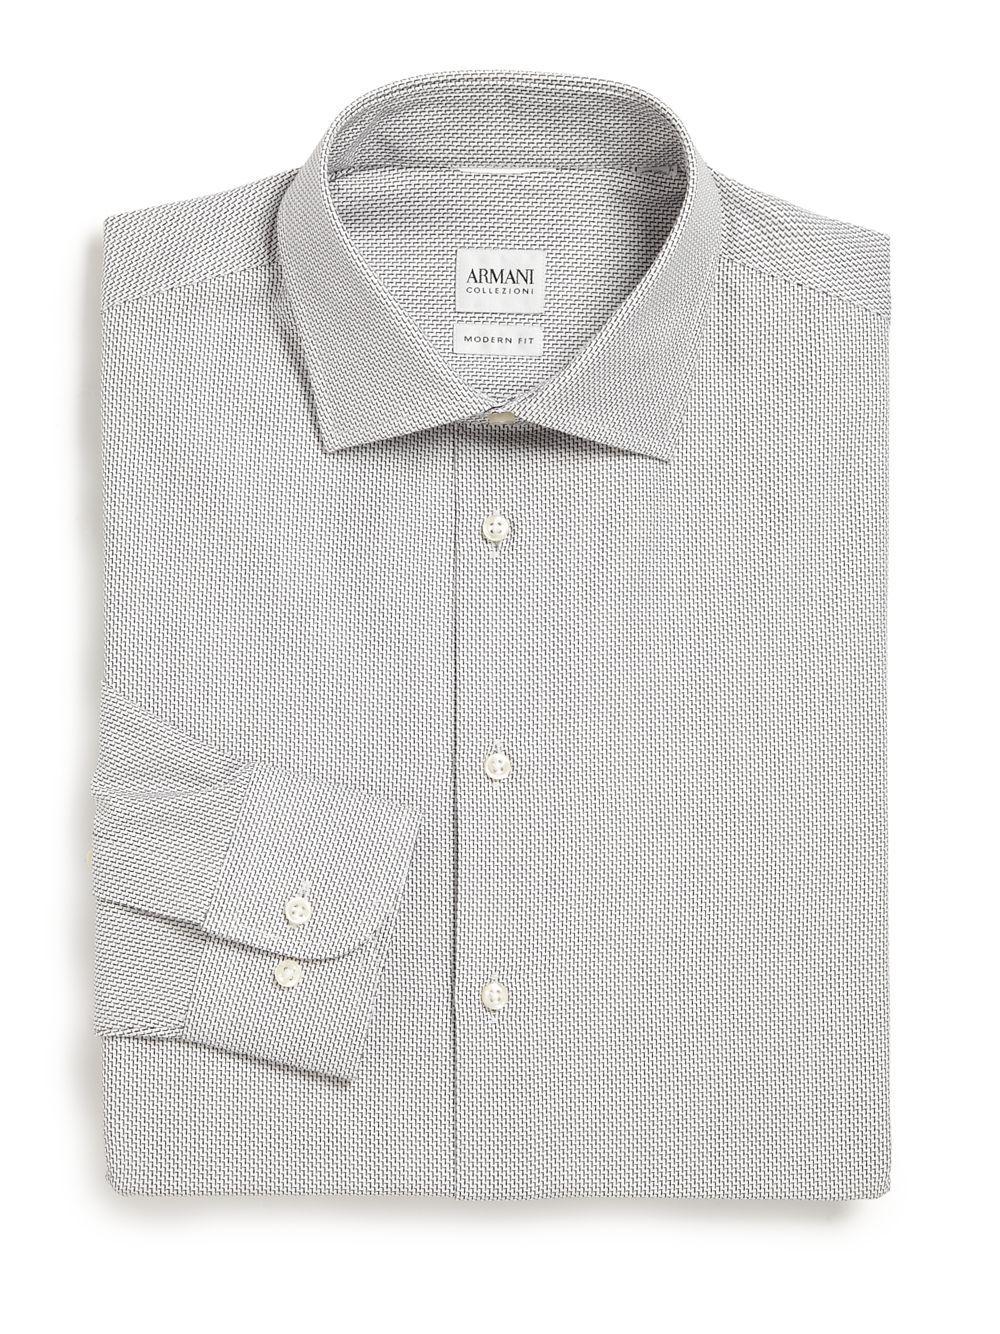 Armani modern fit printed dress shirt in white for men lyst for Modern fit dress shirt